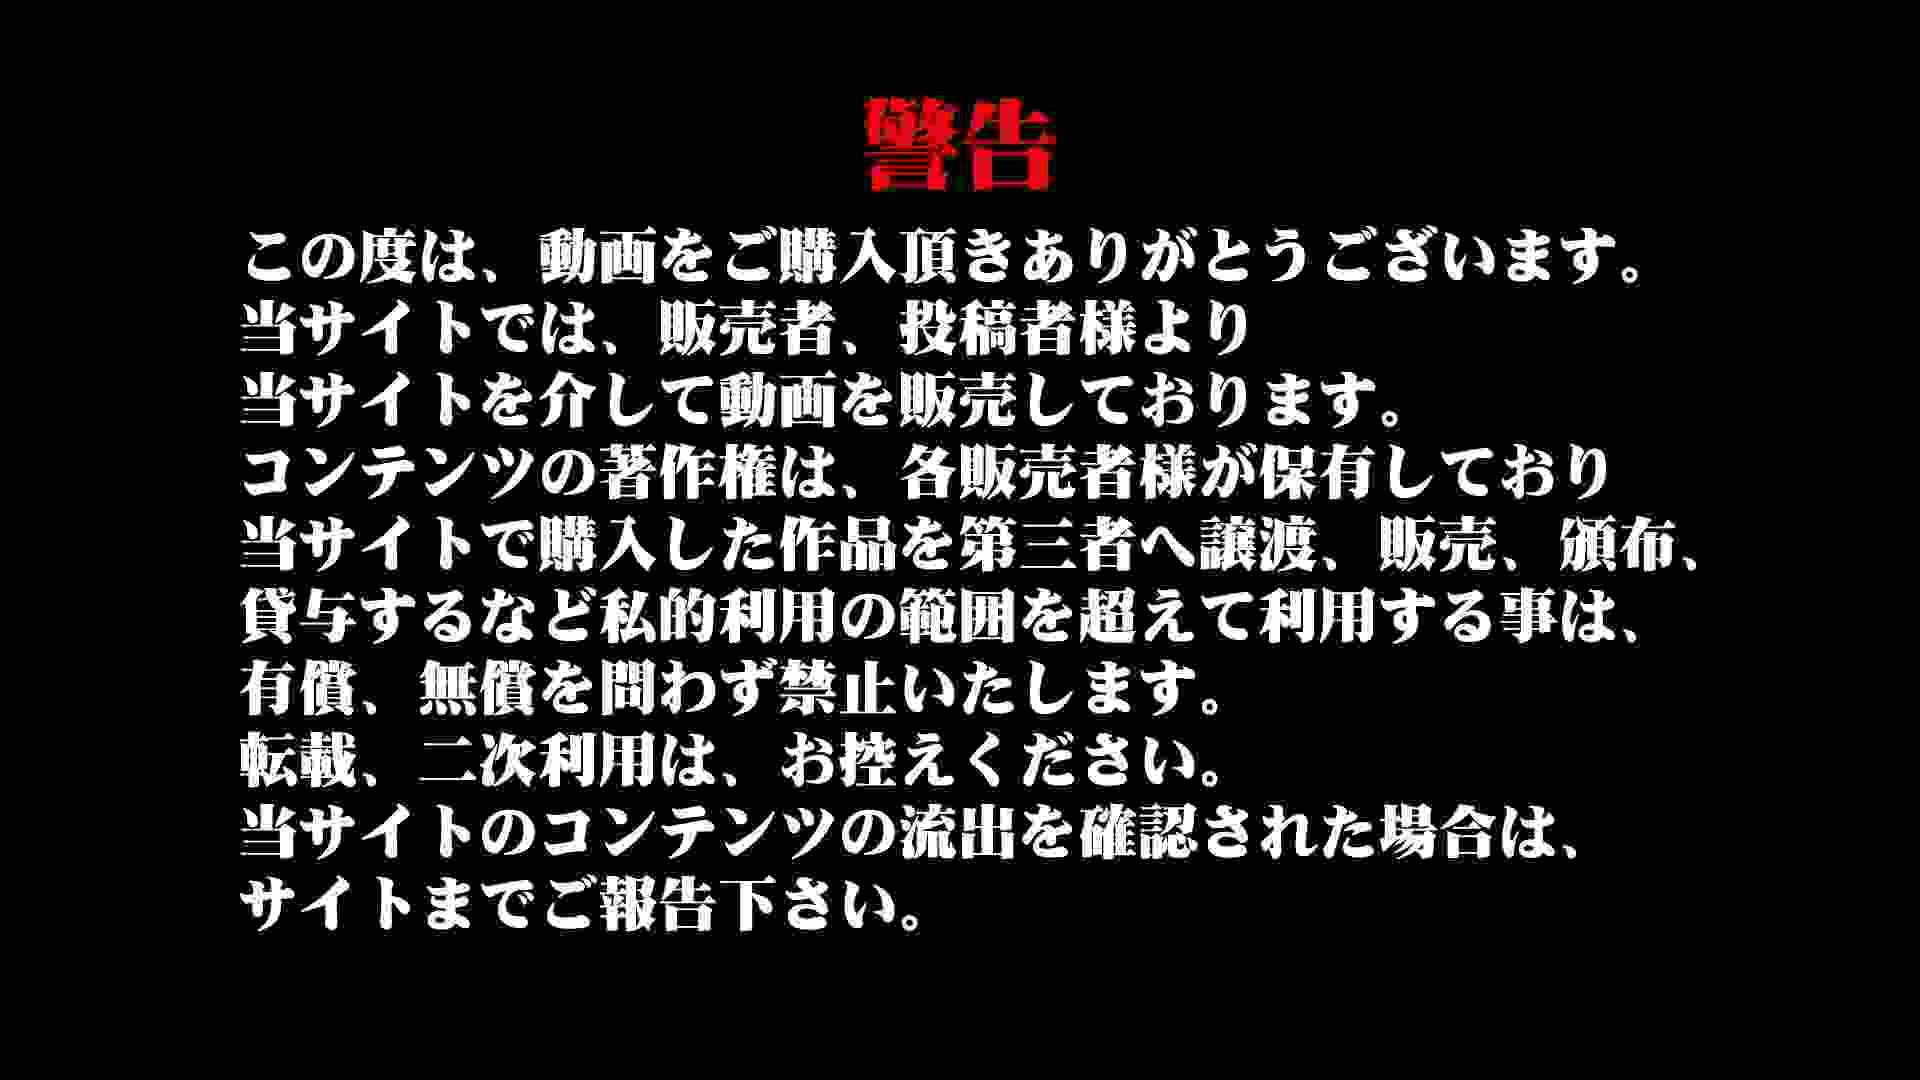 Aquaな露天風呂Vol.963 盗撮シリーズ | 露天風呂編  108PIX 5